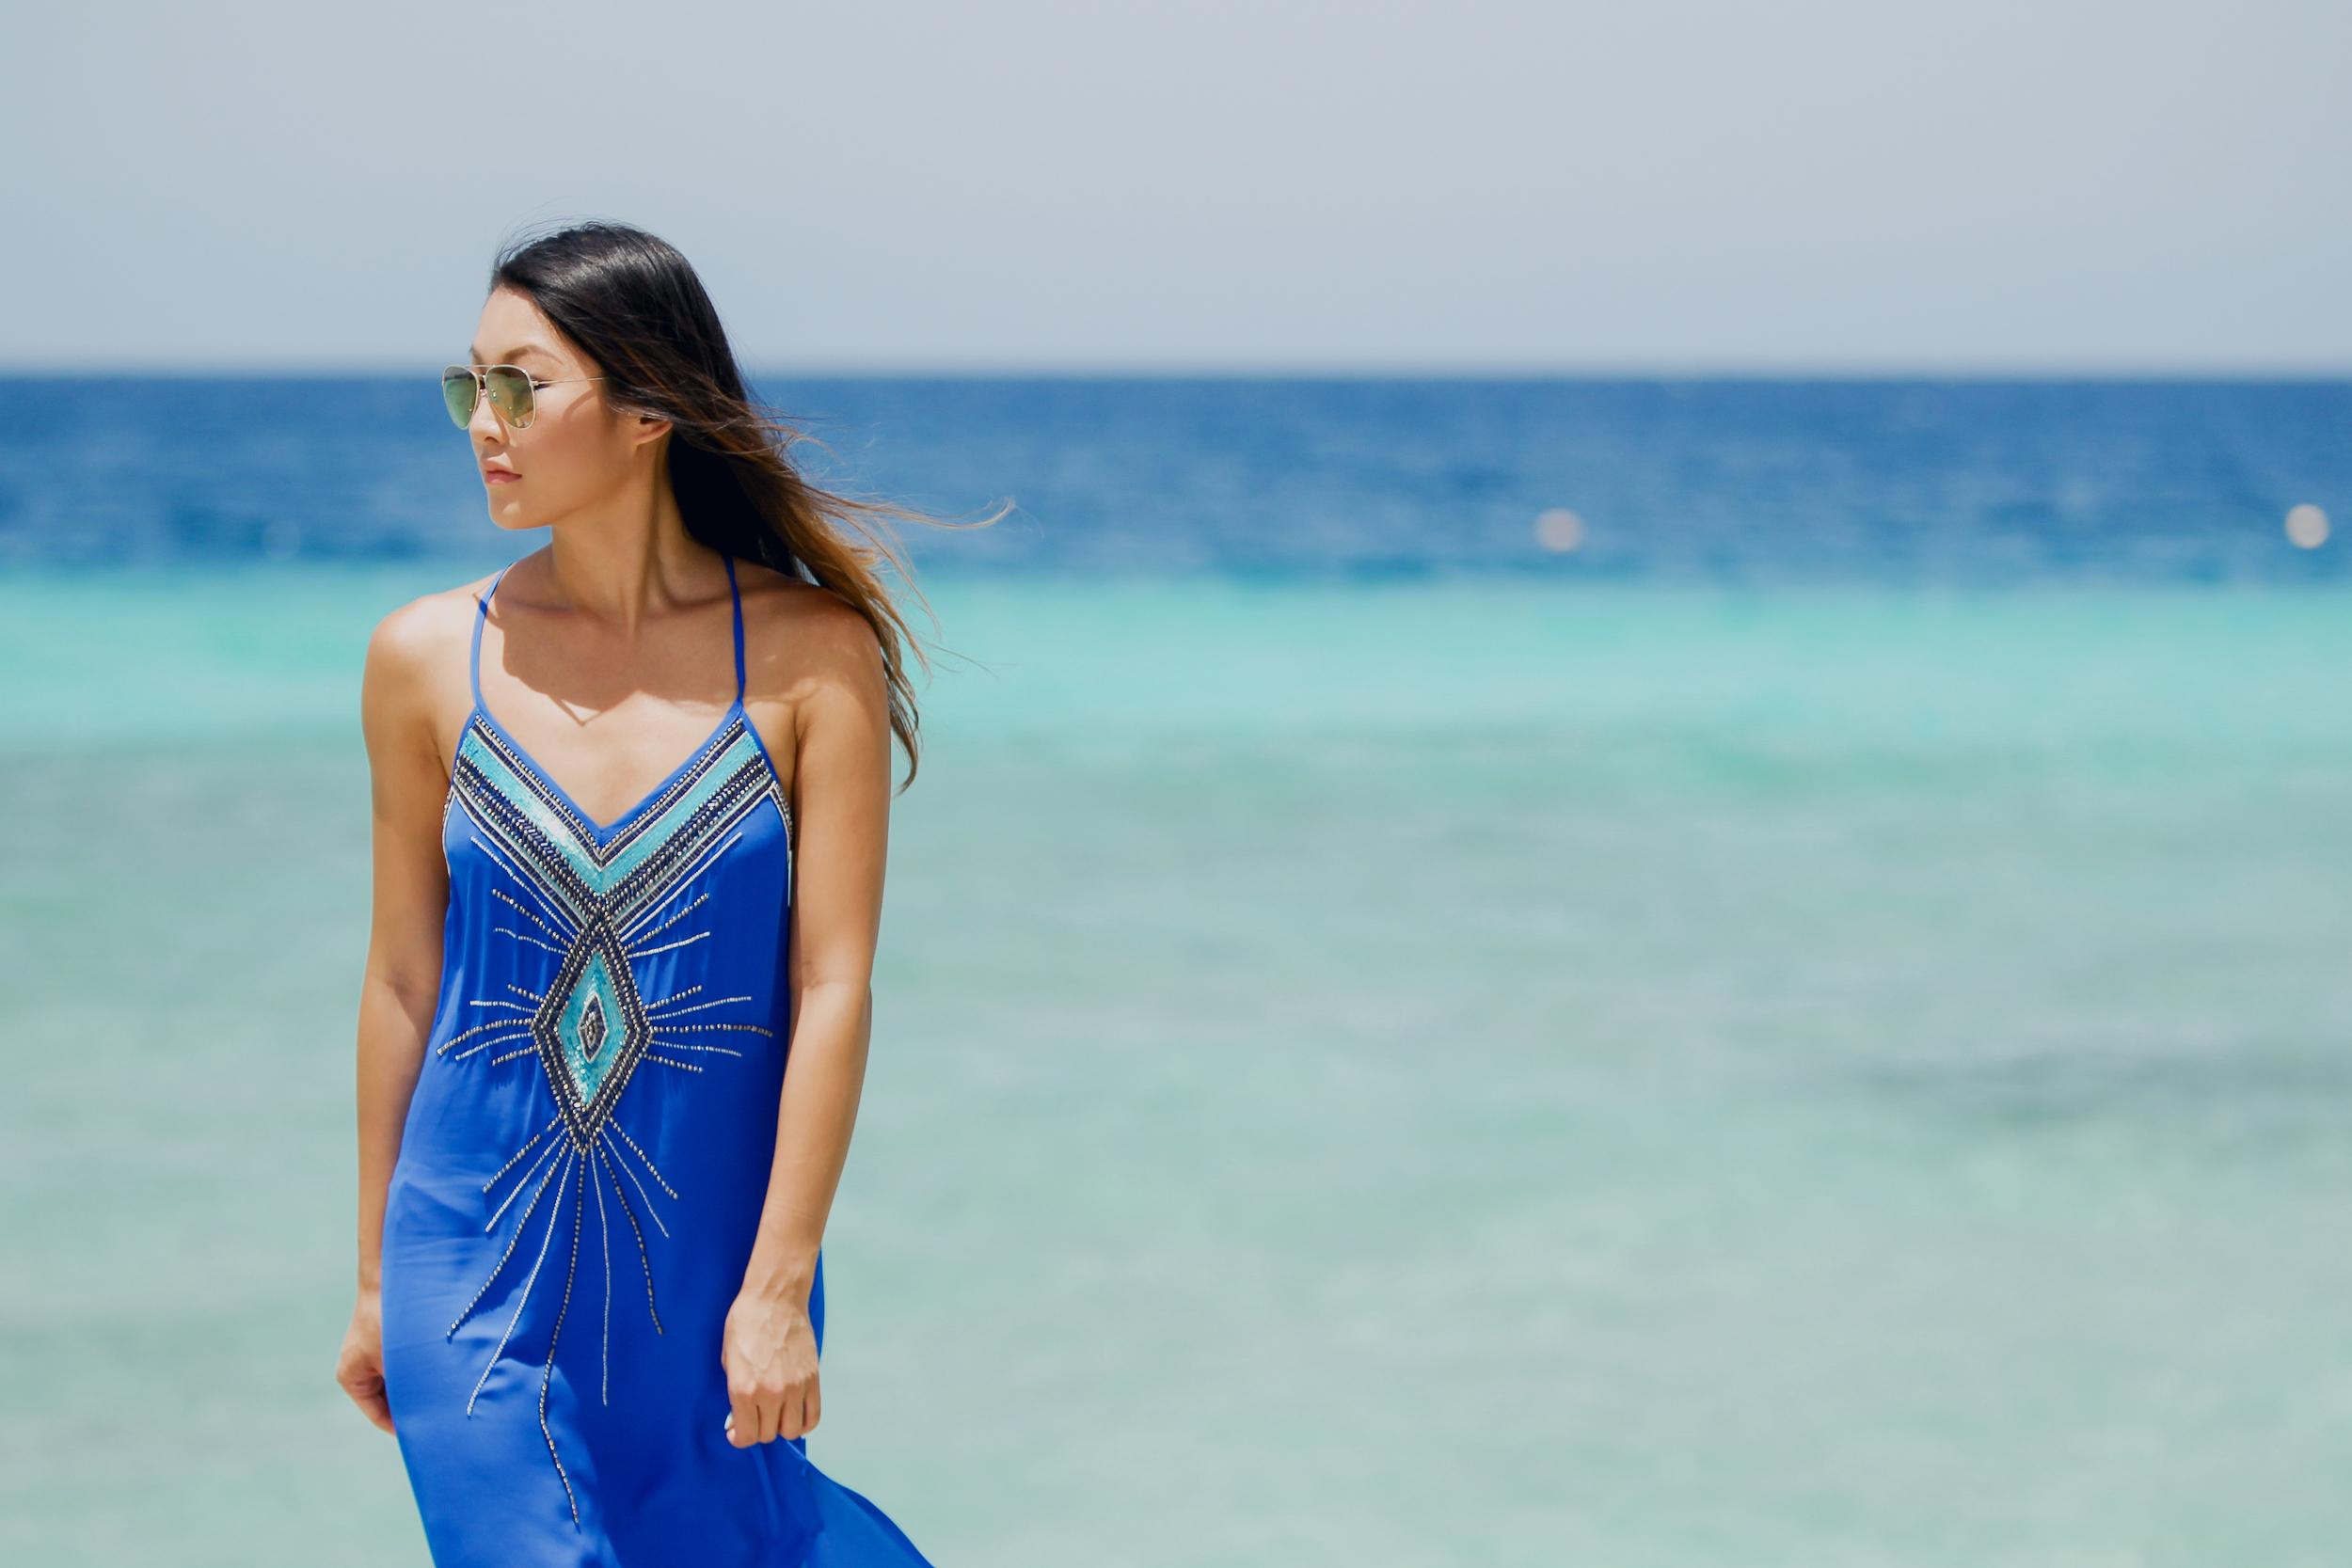 hautehippie_bluedress_beach3.jpg